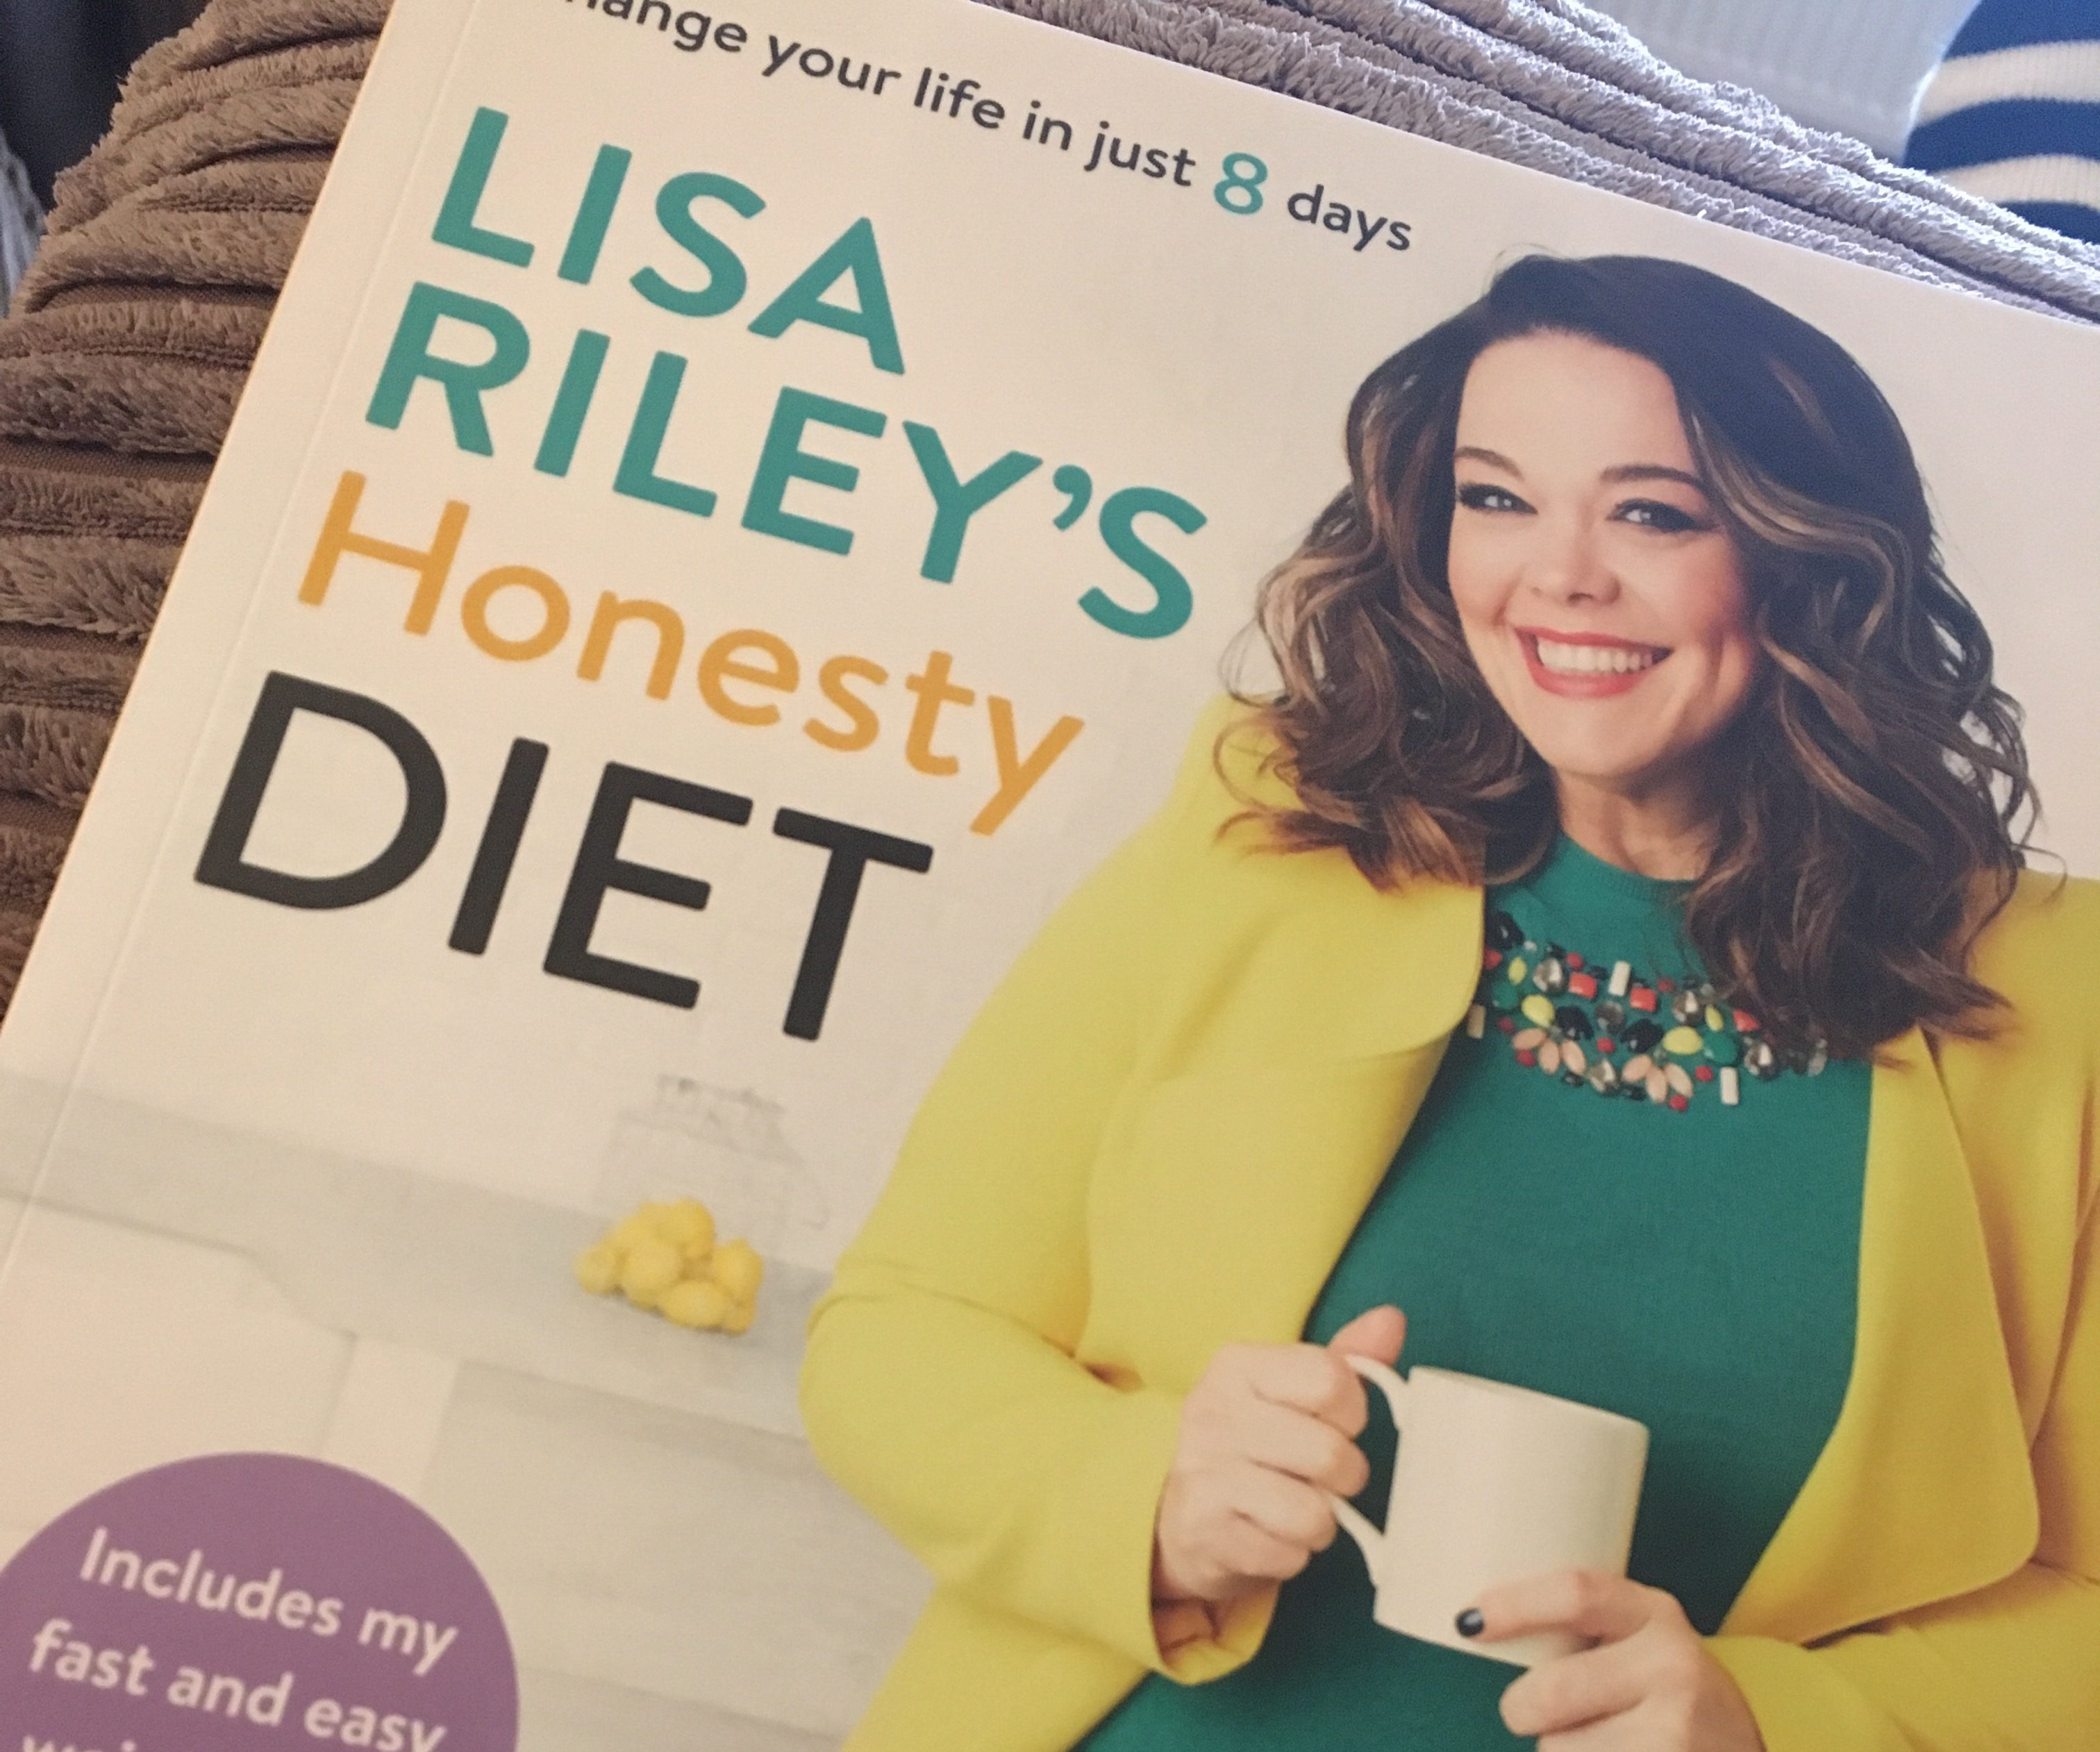 Lisa Riley's Honesty Diet   My Review   FatGirlSkinny.net ...